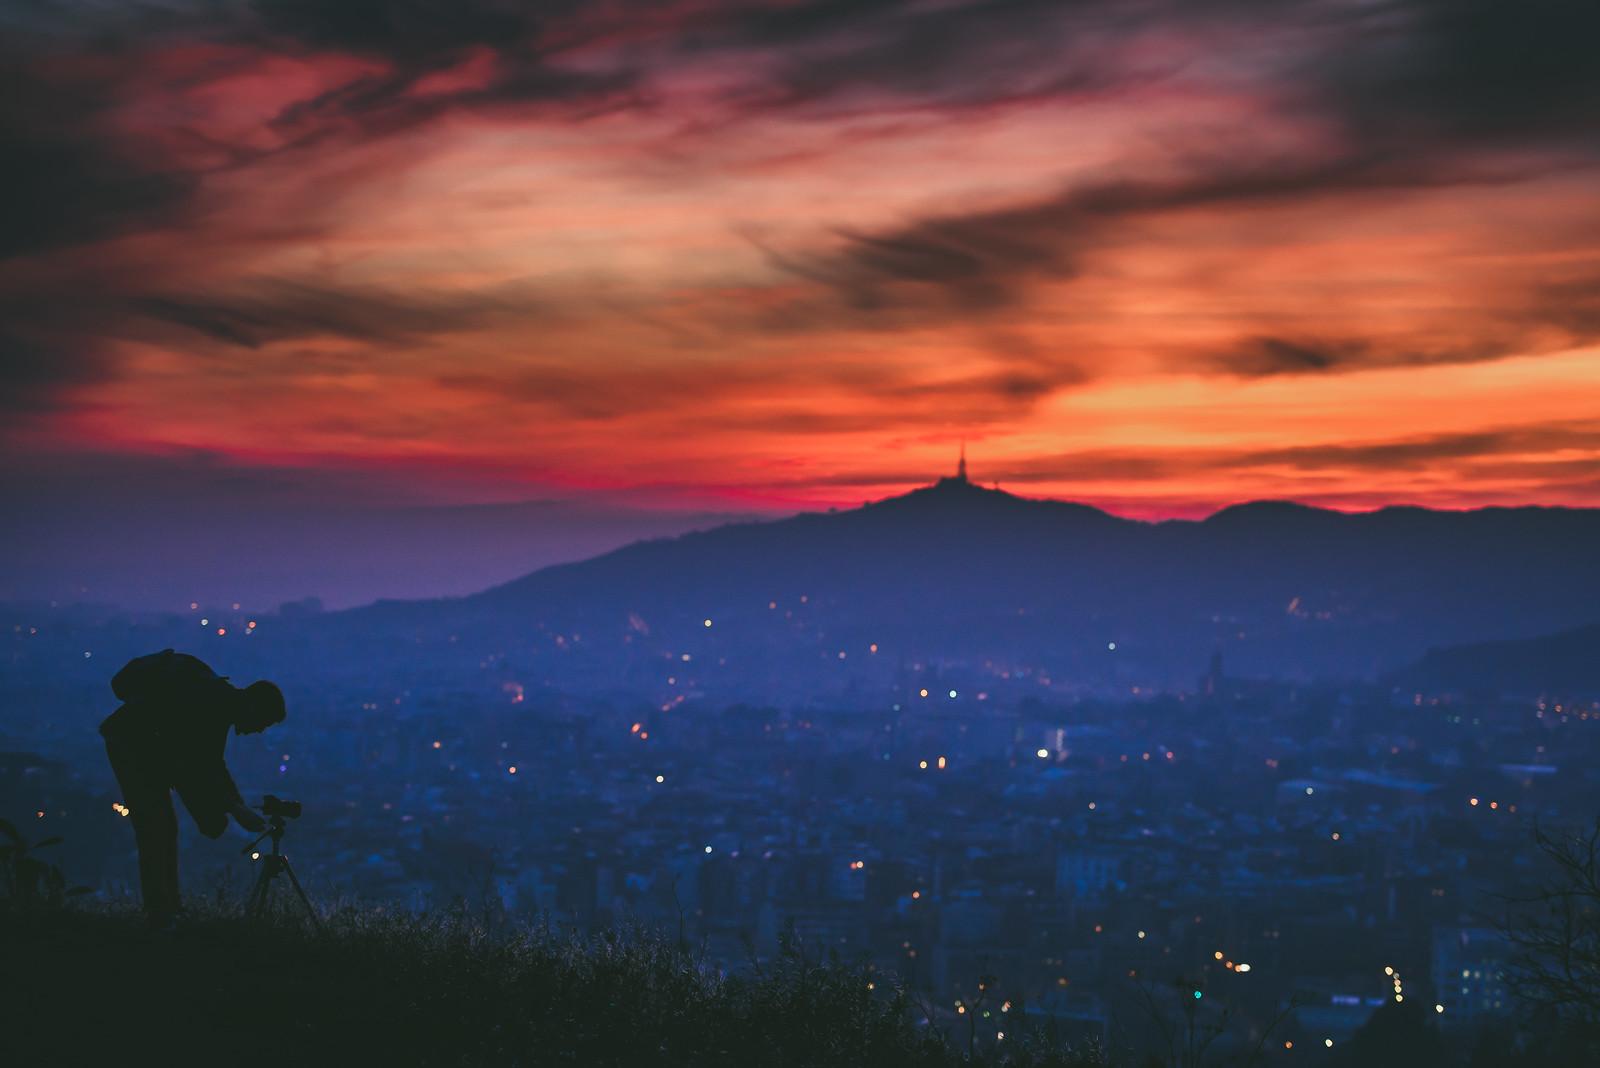 Photographer Silhouette | Barcelona 2015 #359/365